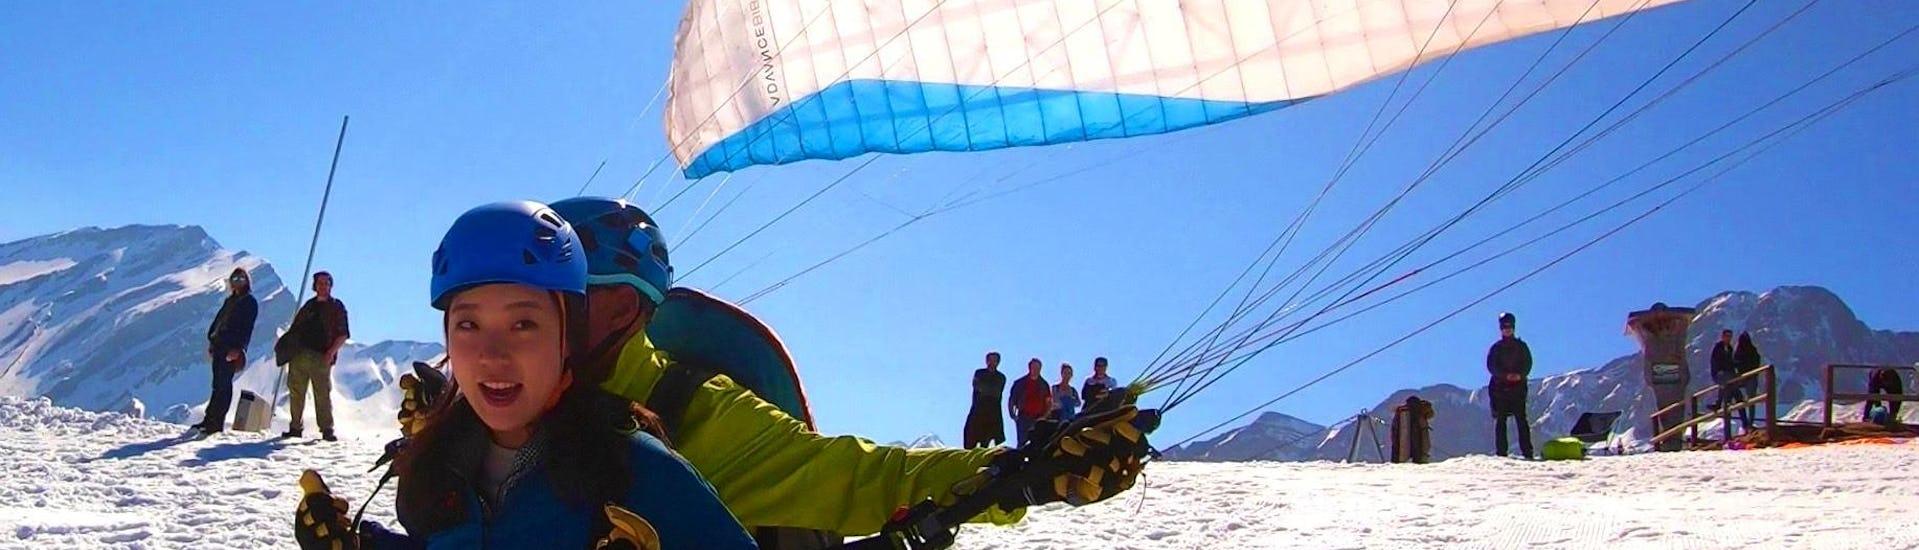 tandem-paragliding-in-niederbauen-view-skyglide-hero